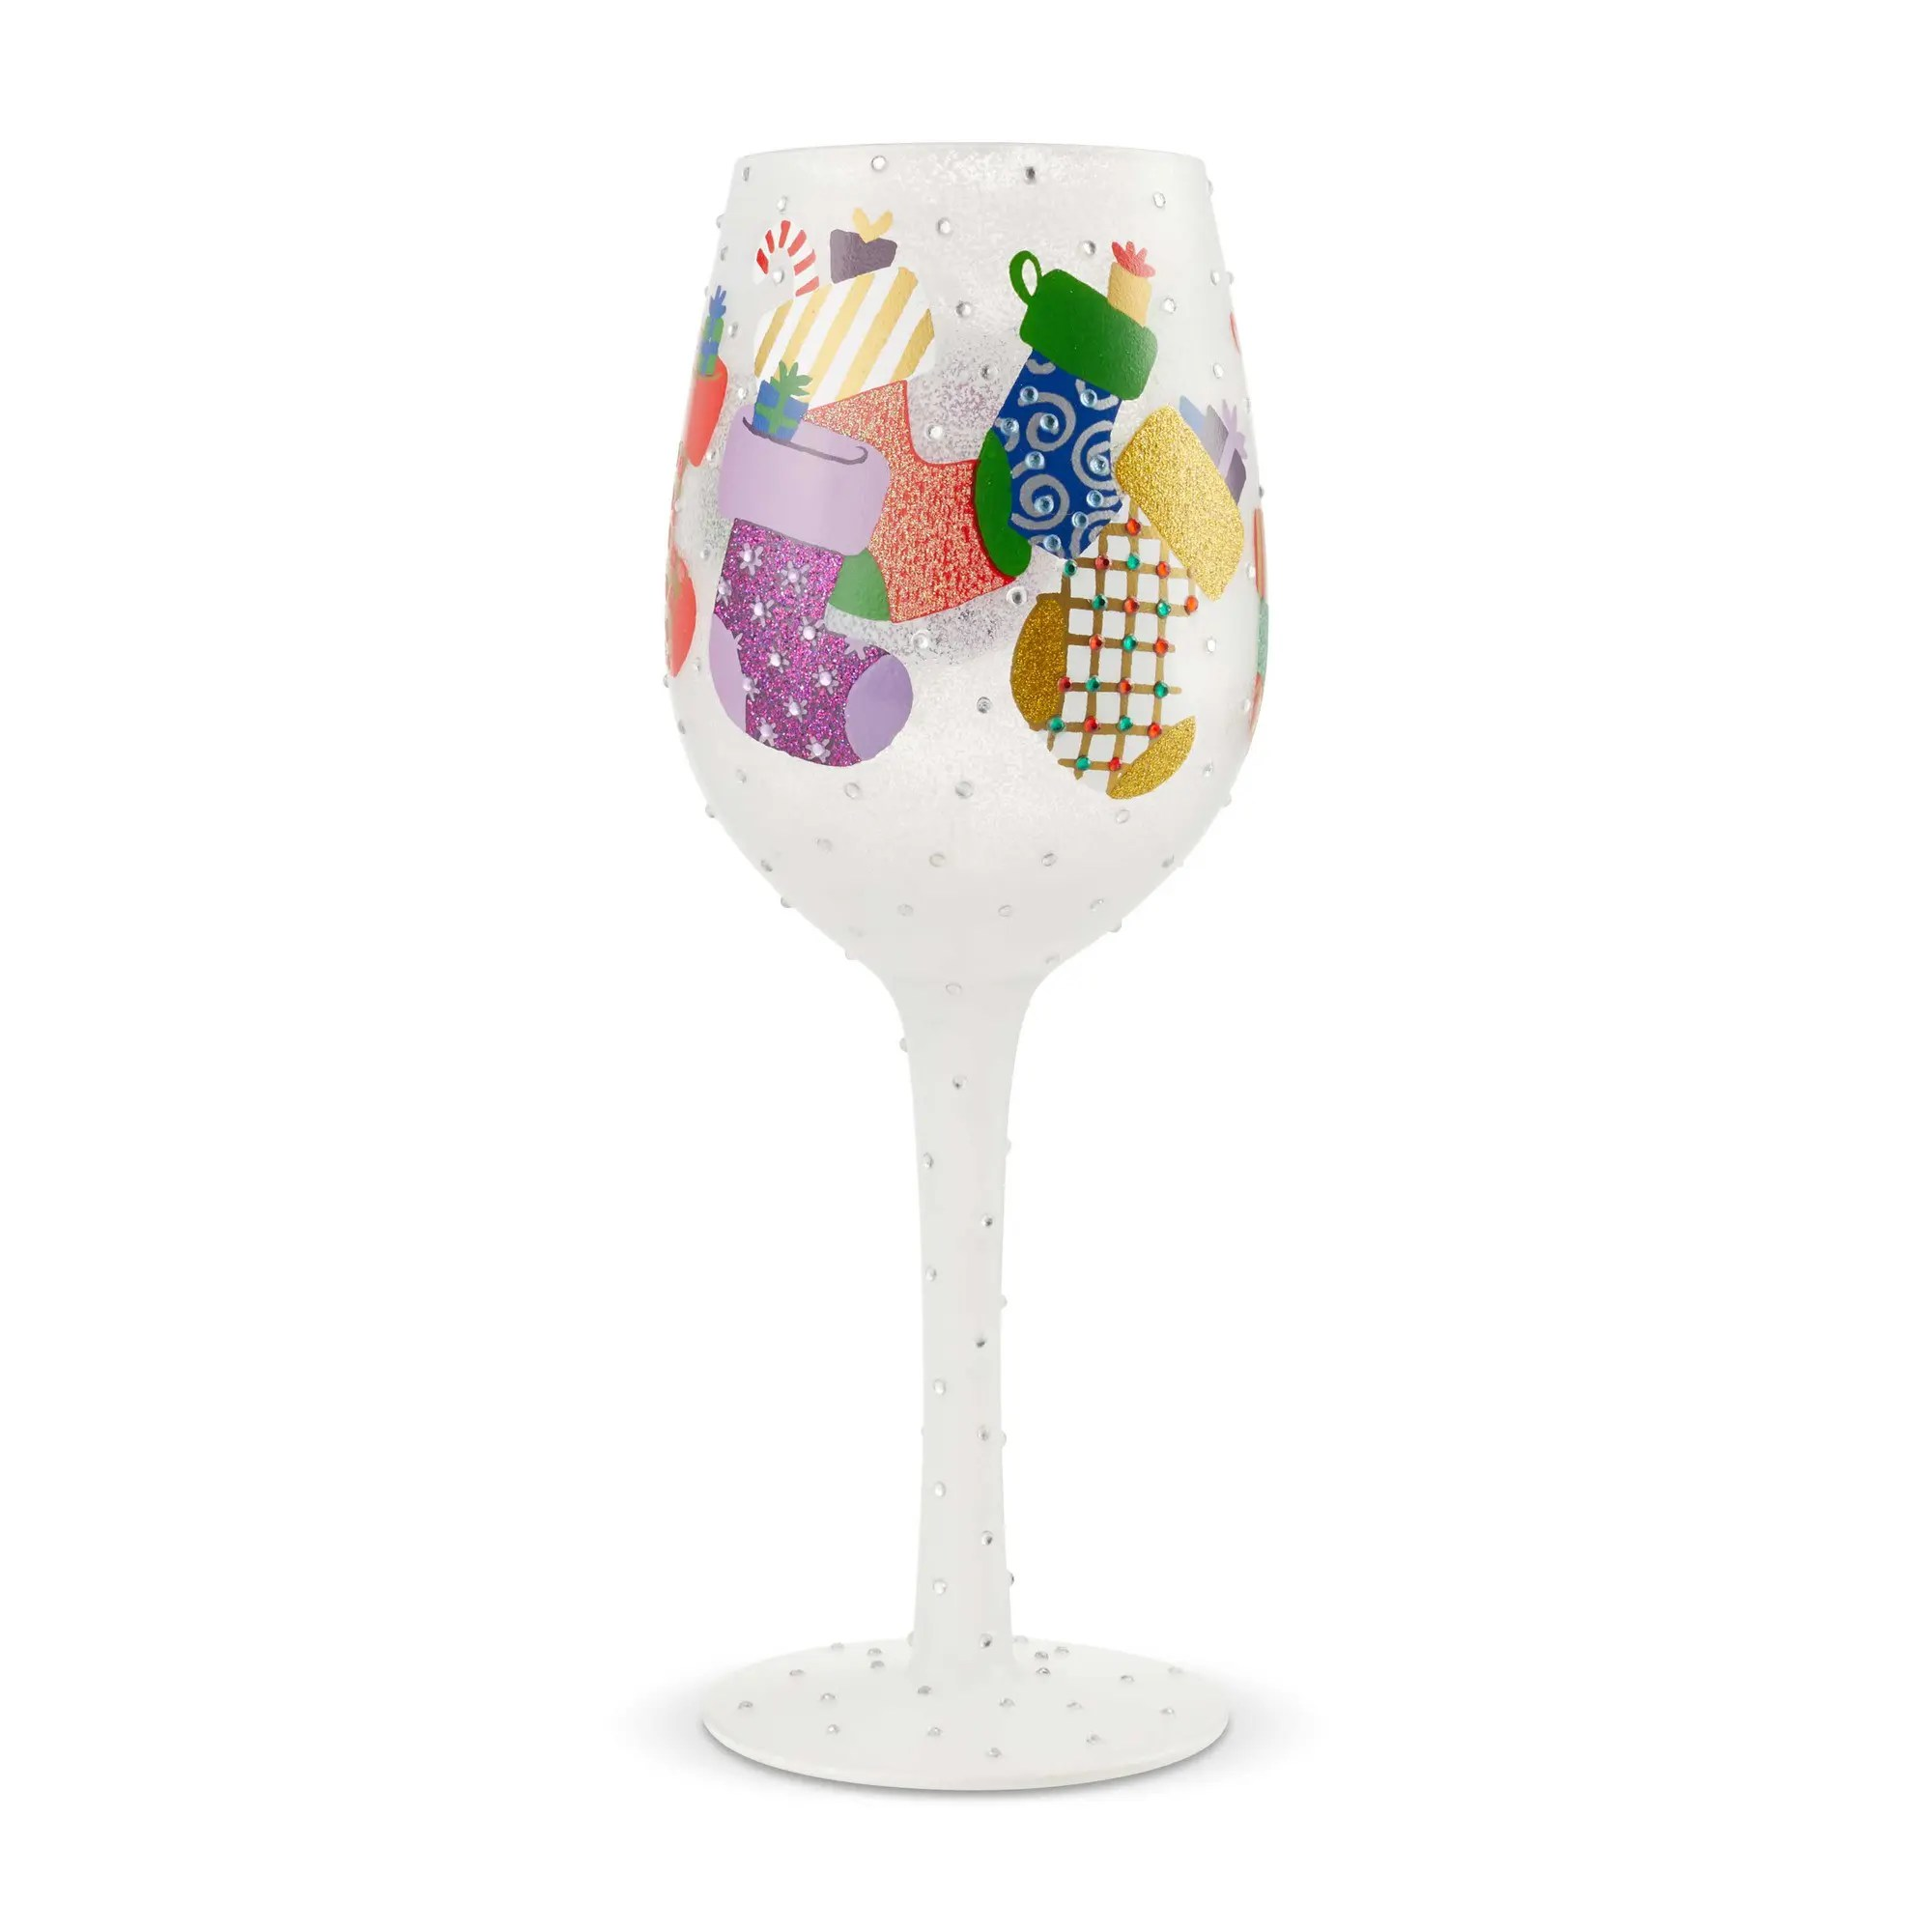 6e32d07a0c2 Stockings 15oz. Wine Glass by Lolita 6004431